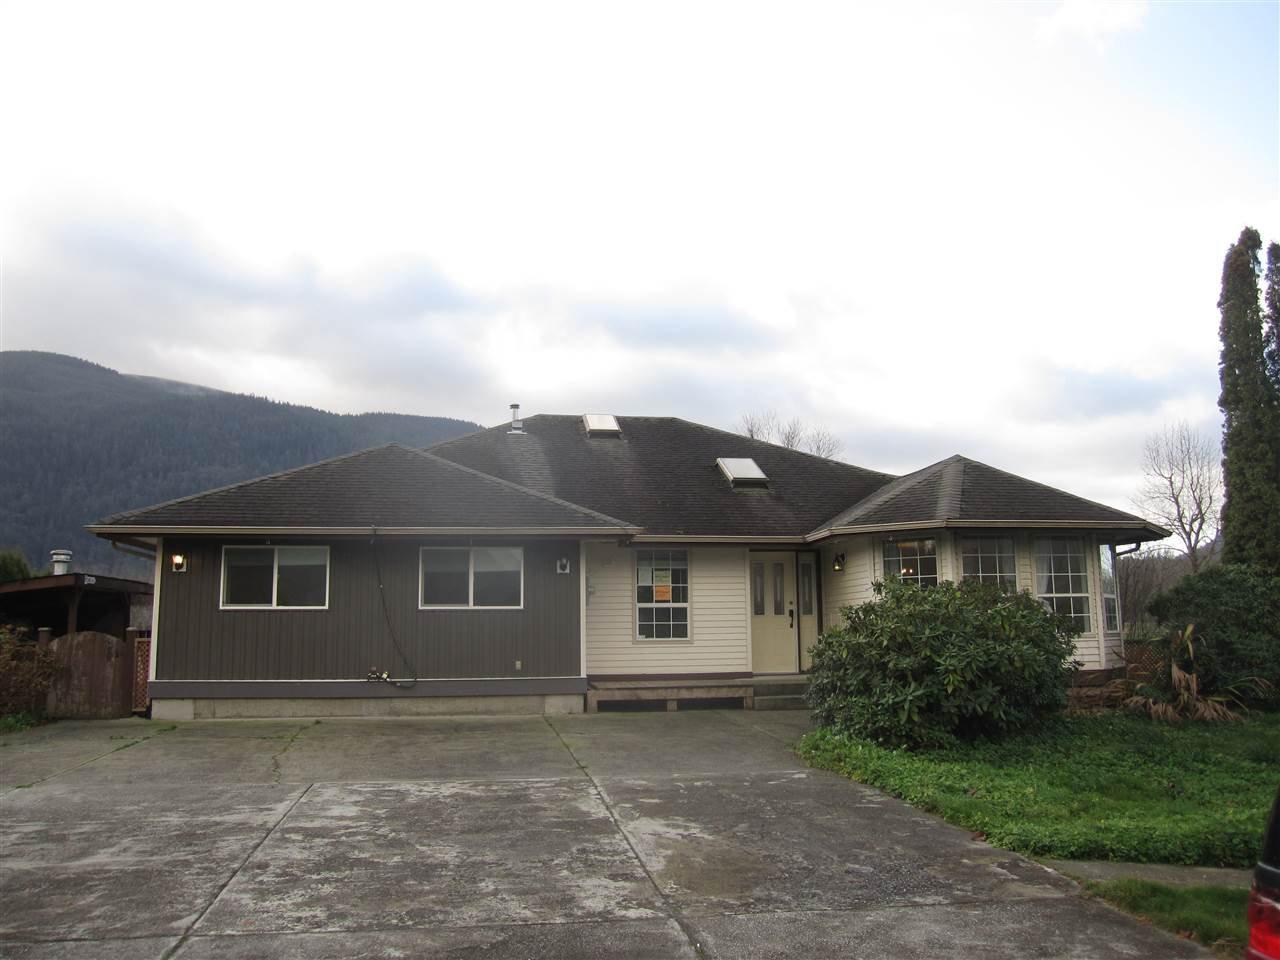 Main Photo: 38806 NICOMEN ISLAND TRUNK Road in Mission: Dewdney Deroche House for sale : MLS®# R2422265